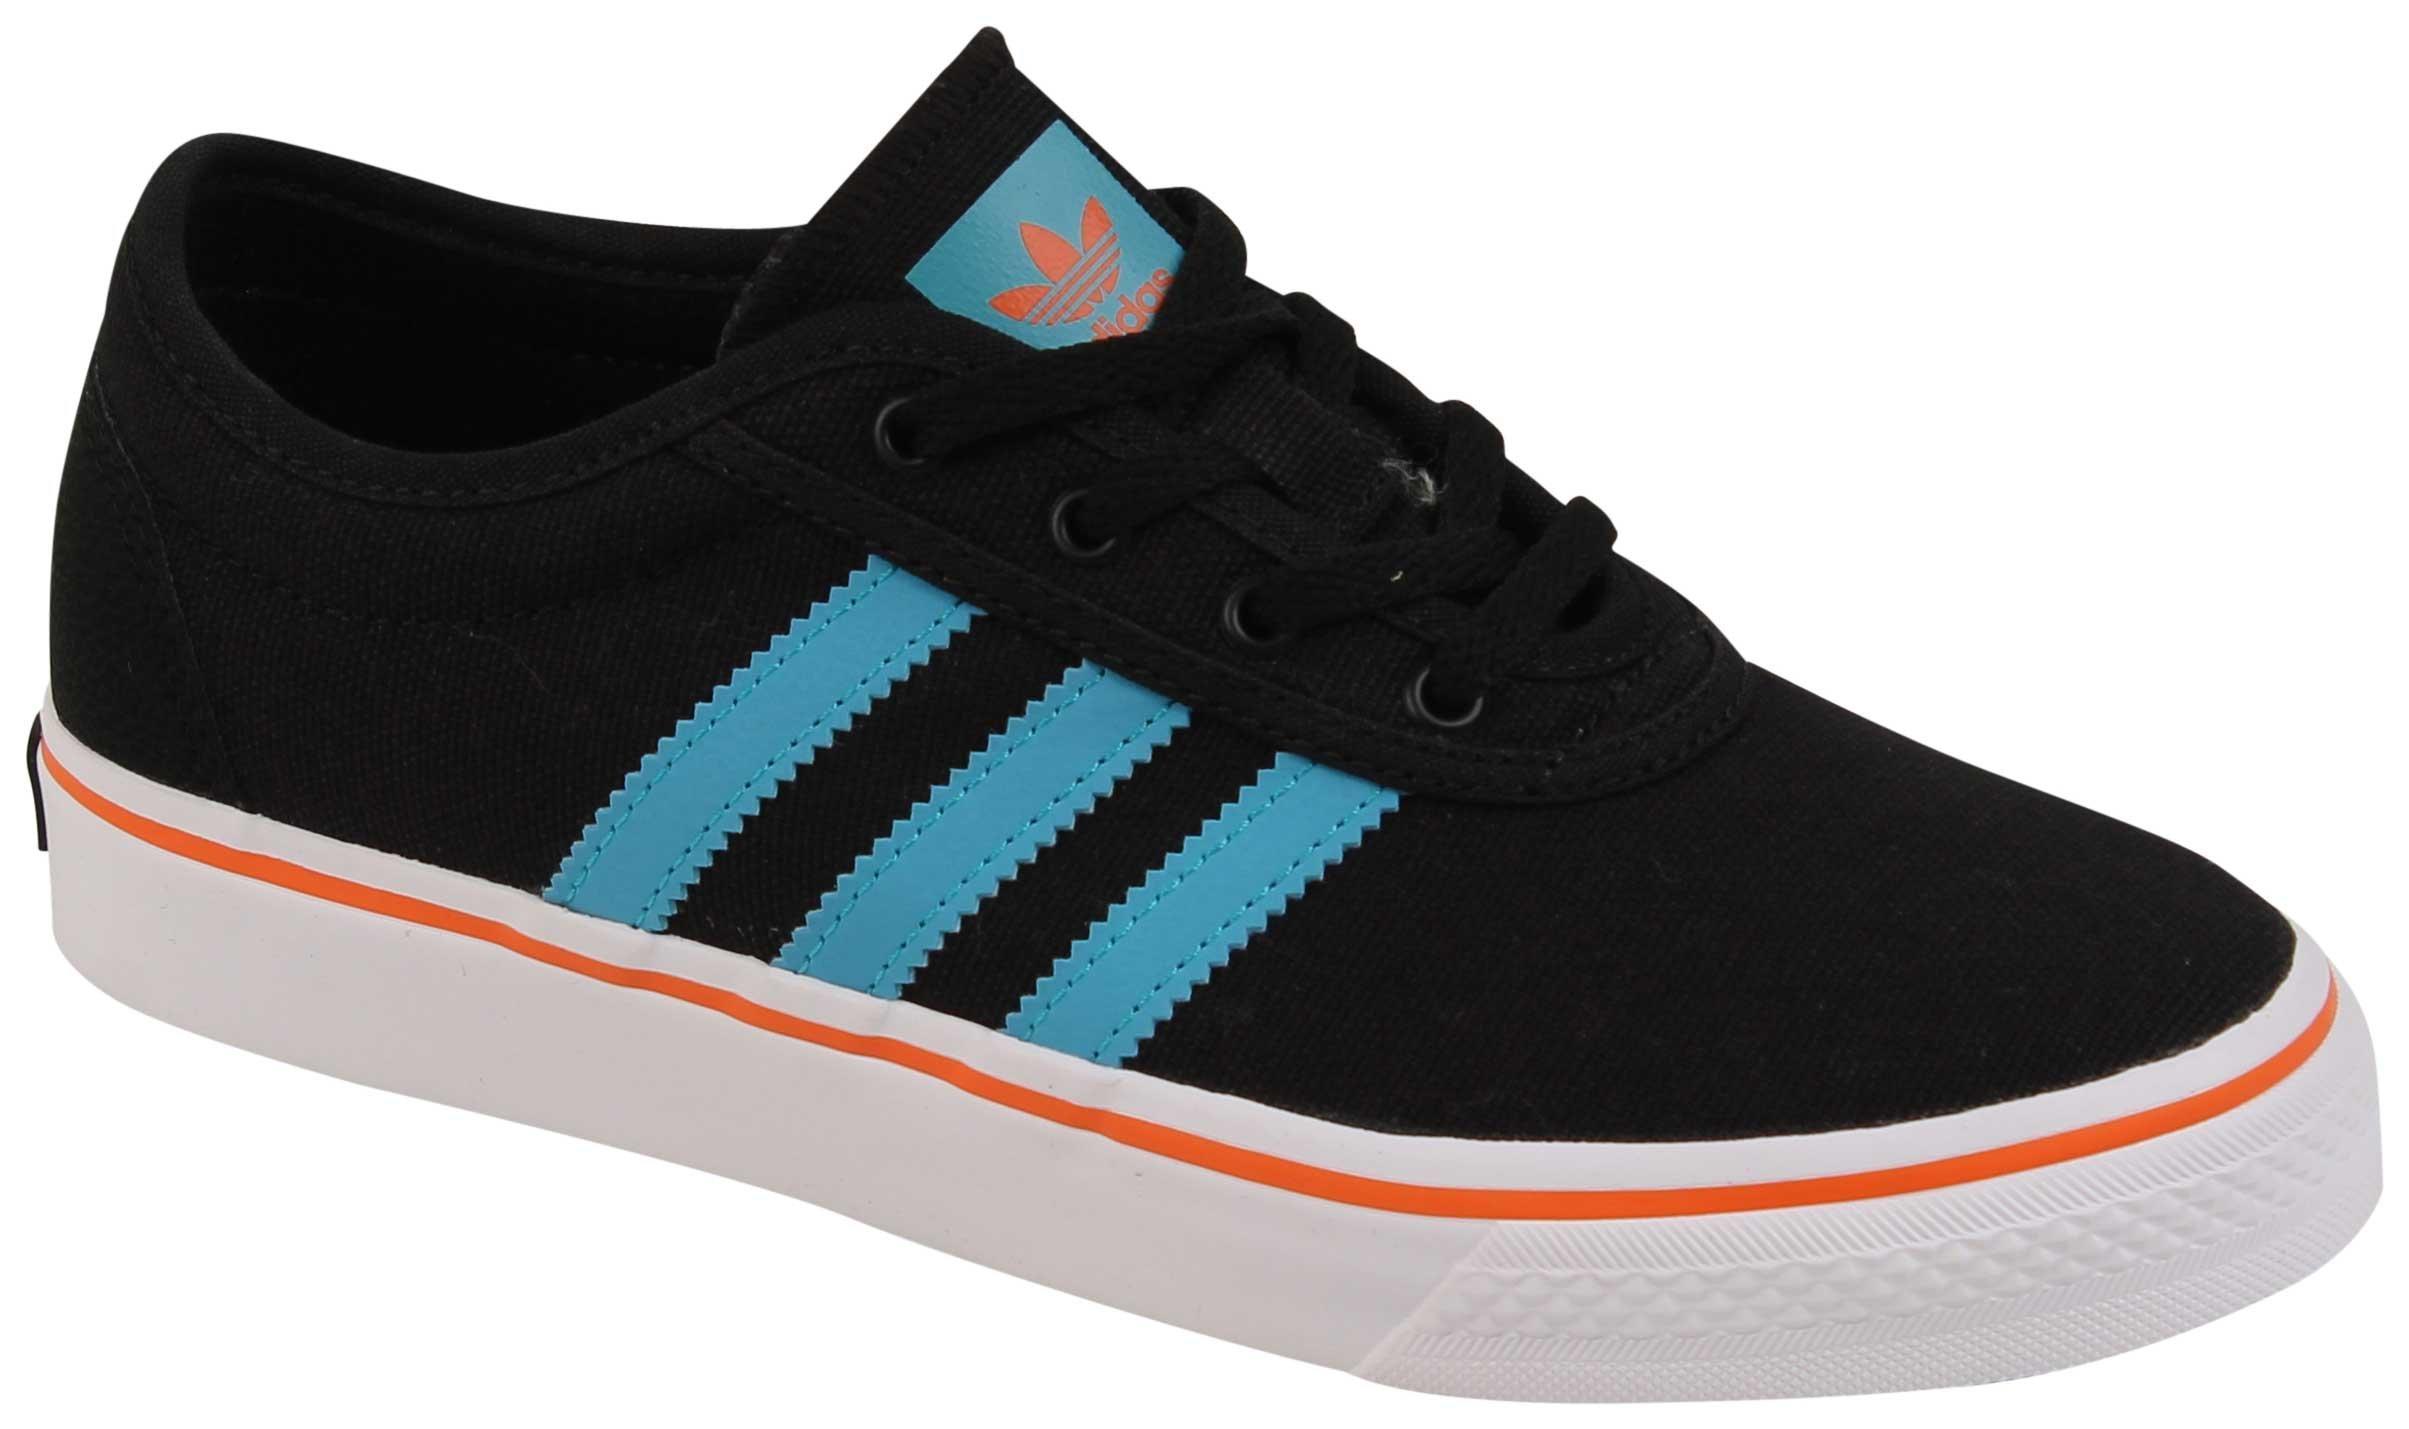 adidas Skateboarding Unisex Adi-Ease J (Little Kid/Big Kid) Core Black/Energy Blue/Energy Blue Athletic Shoe